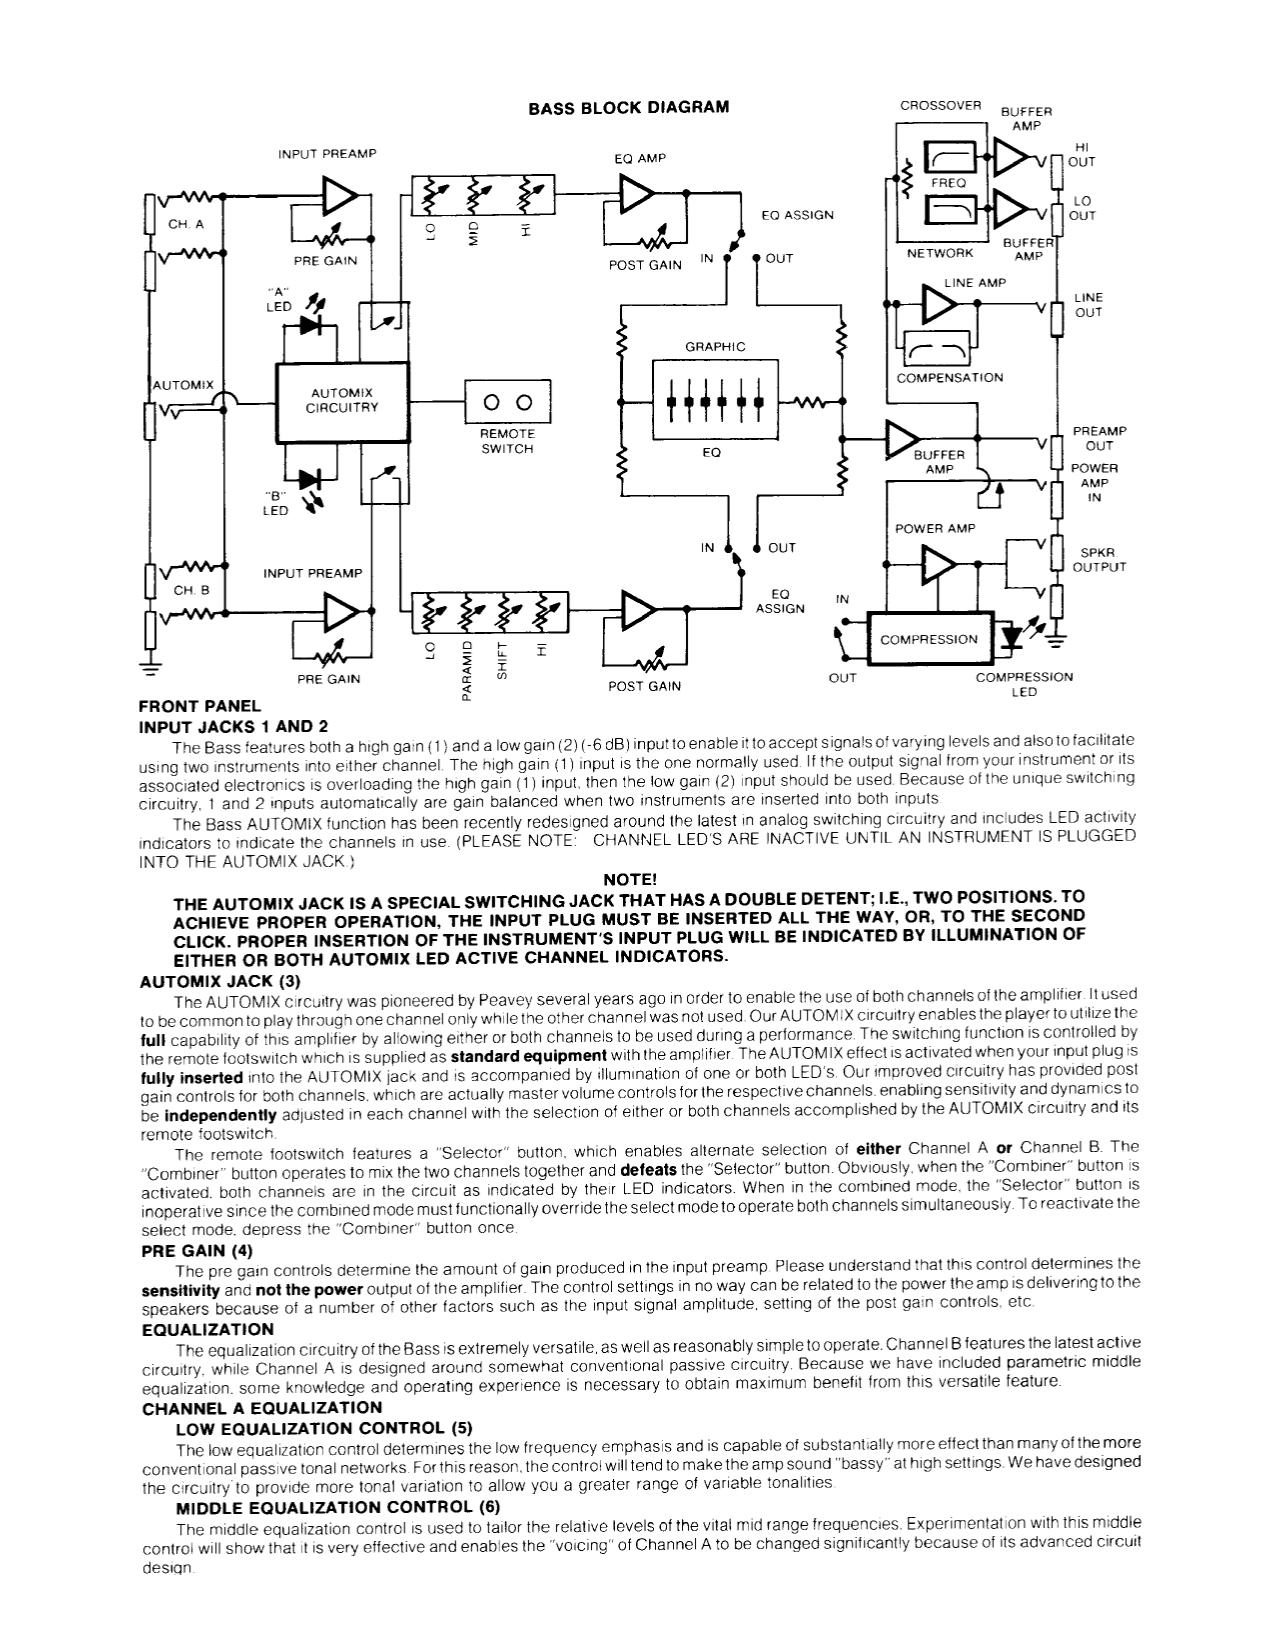 Peavey Musician Schematic Diagrams Kikker 5150 Wiring Diagram Pdf Manual For Amp Mark Iii Series